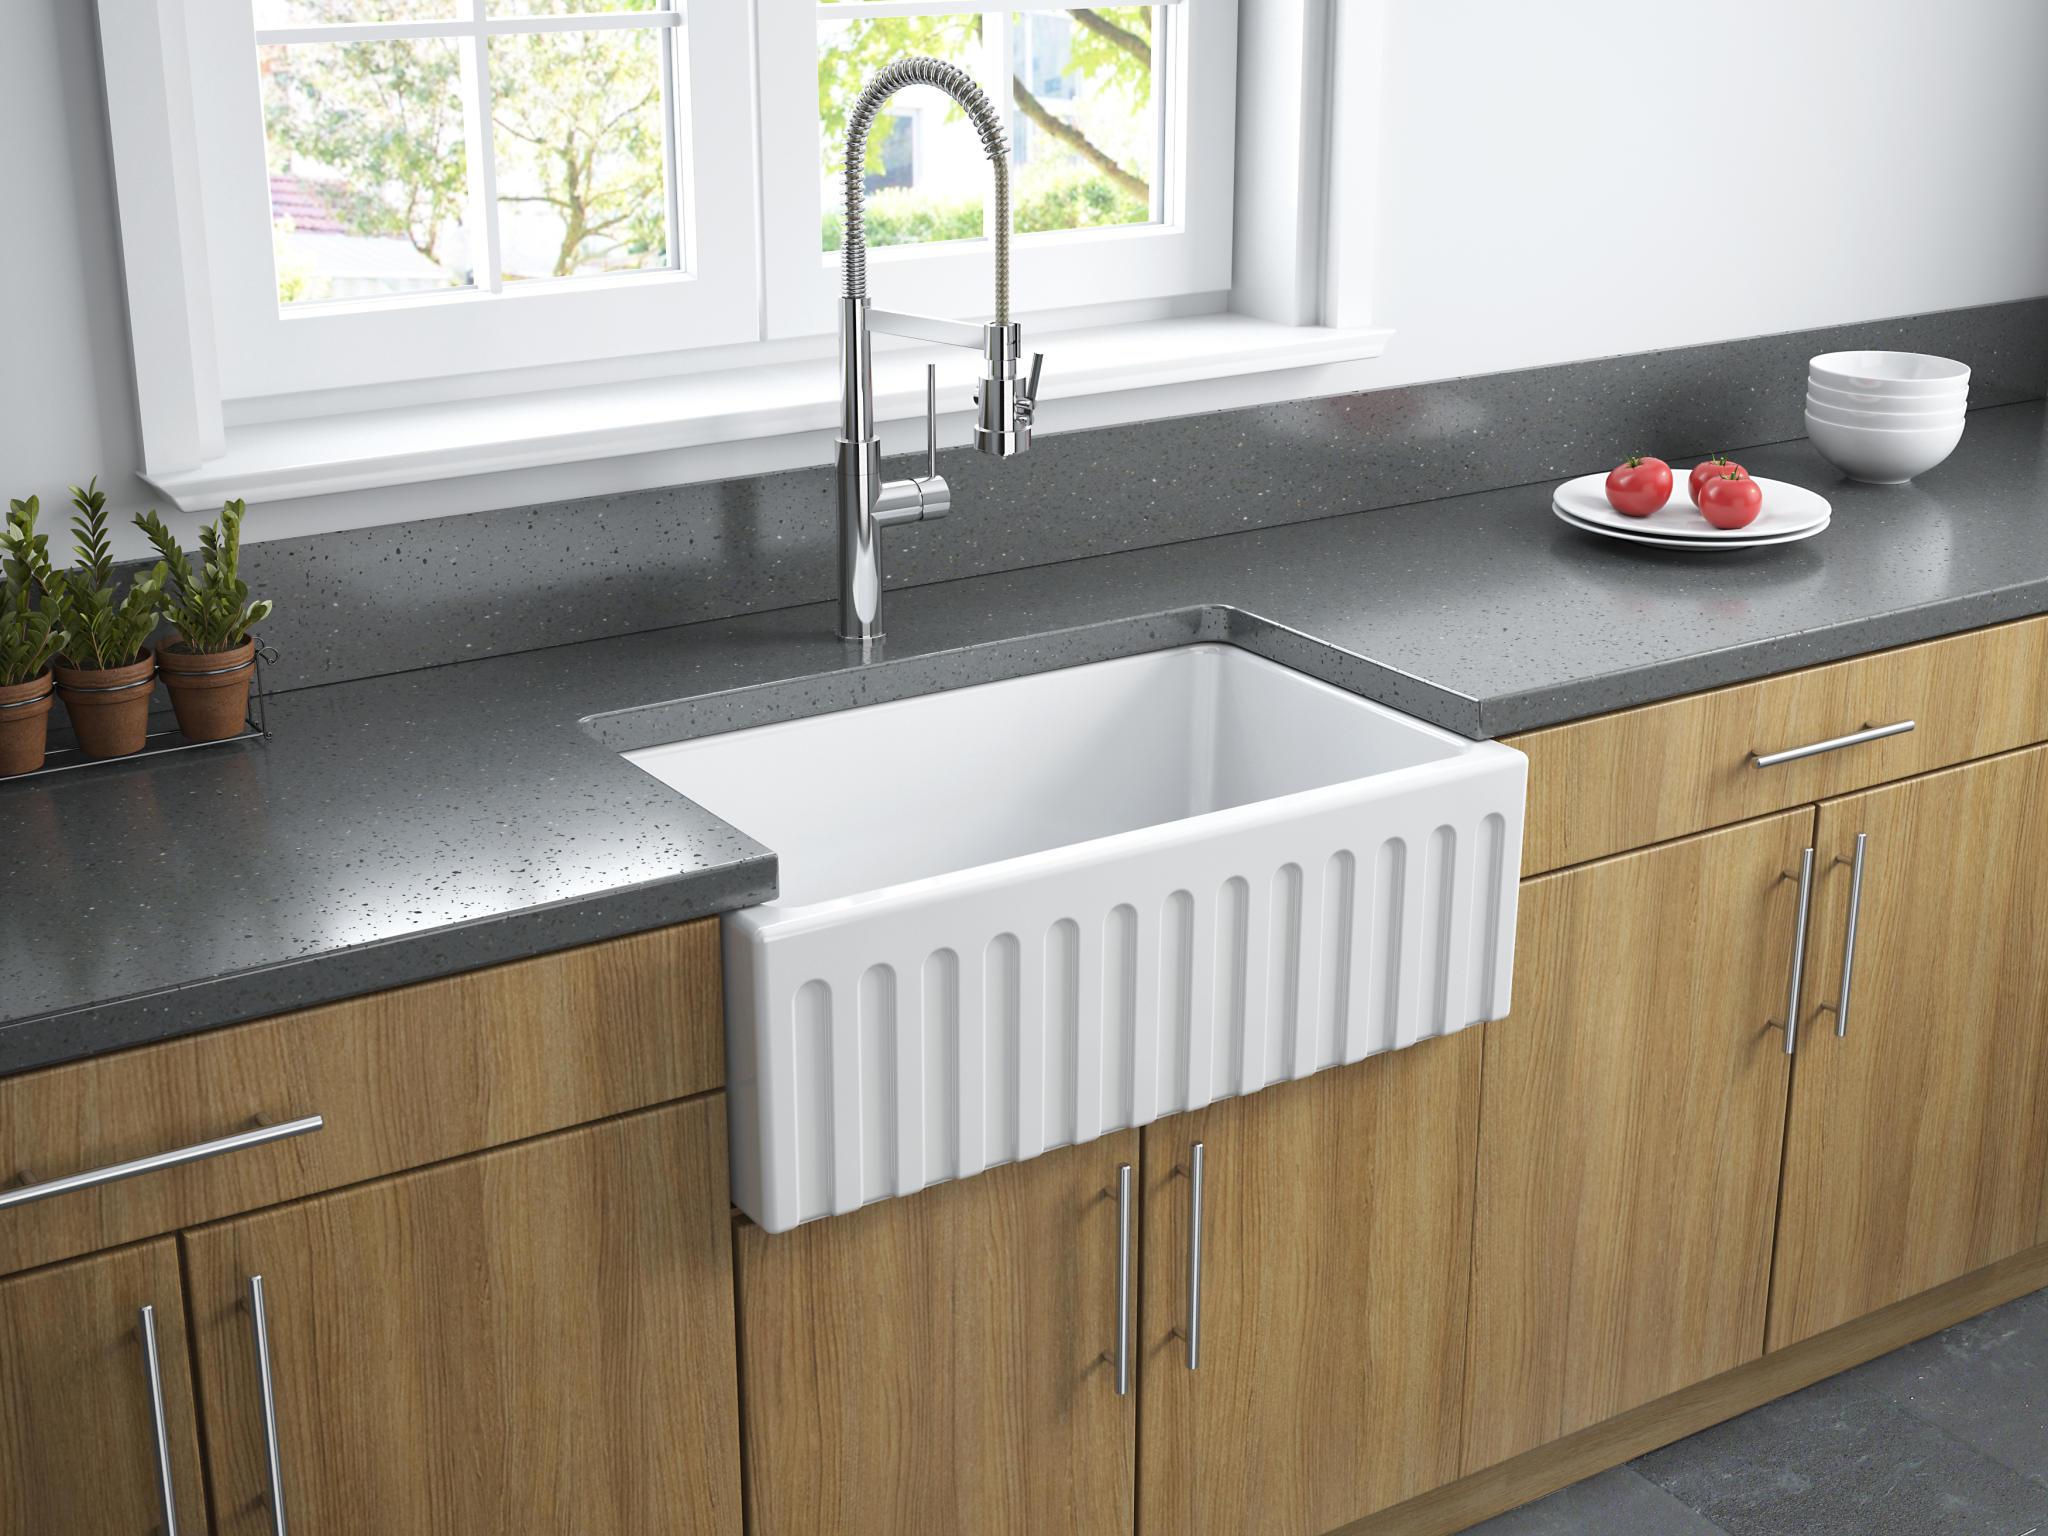 whats right sink size kitchen kitchen sink sizes Latoscana 30 Reversible Fireclay Farmhouse Kitchen Sink